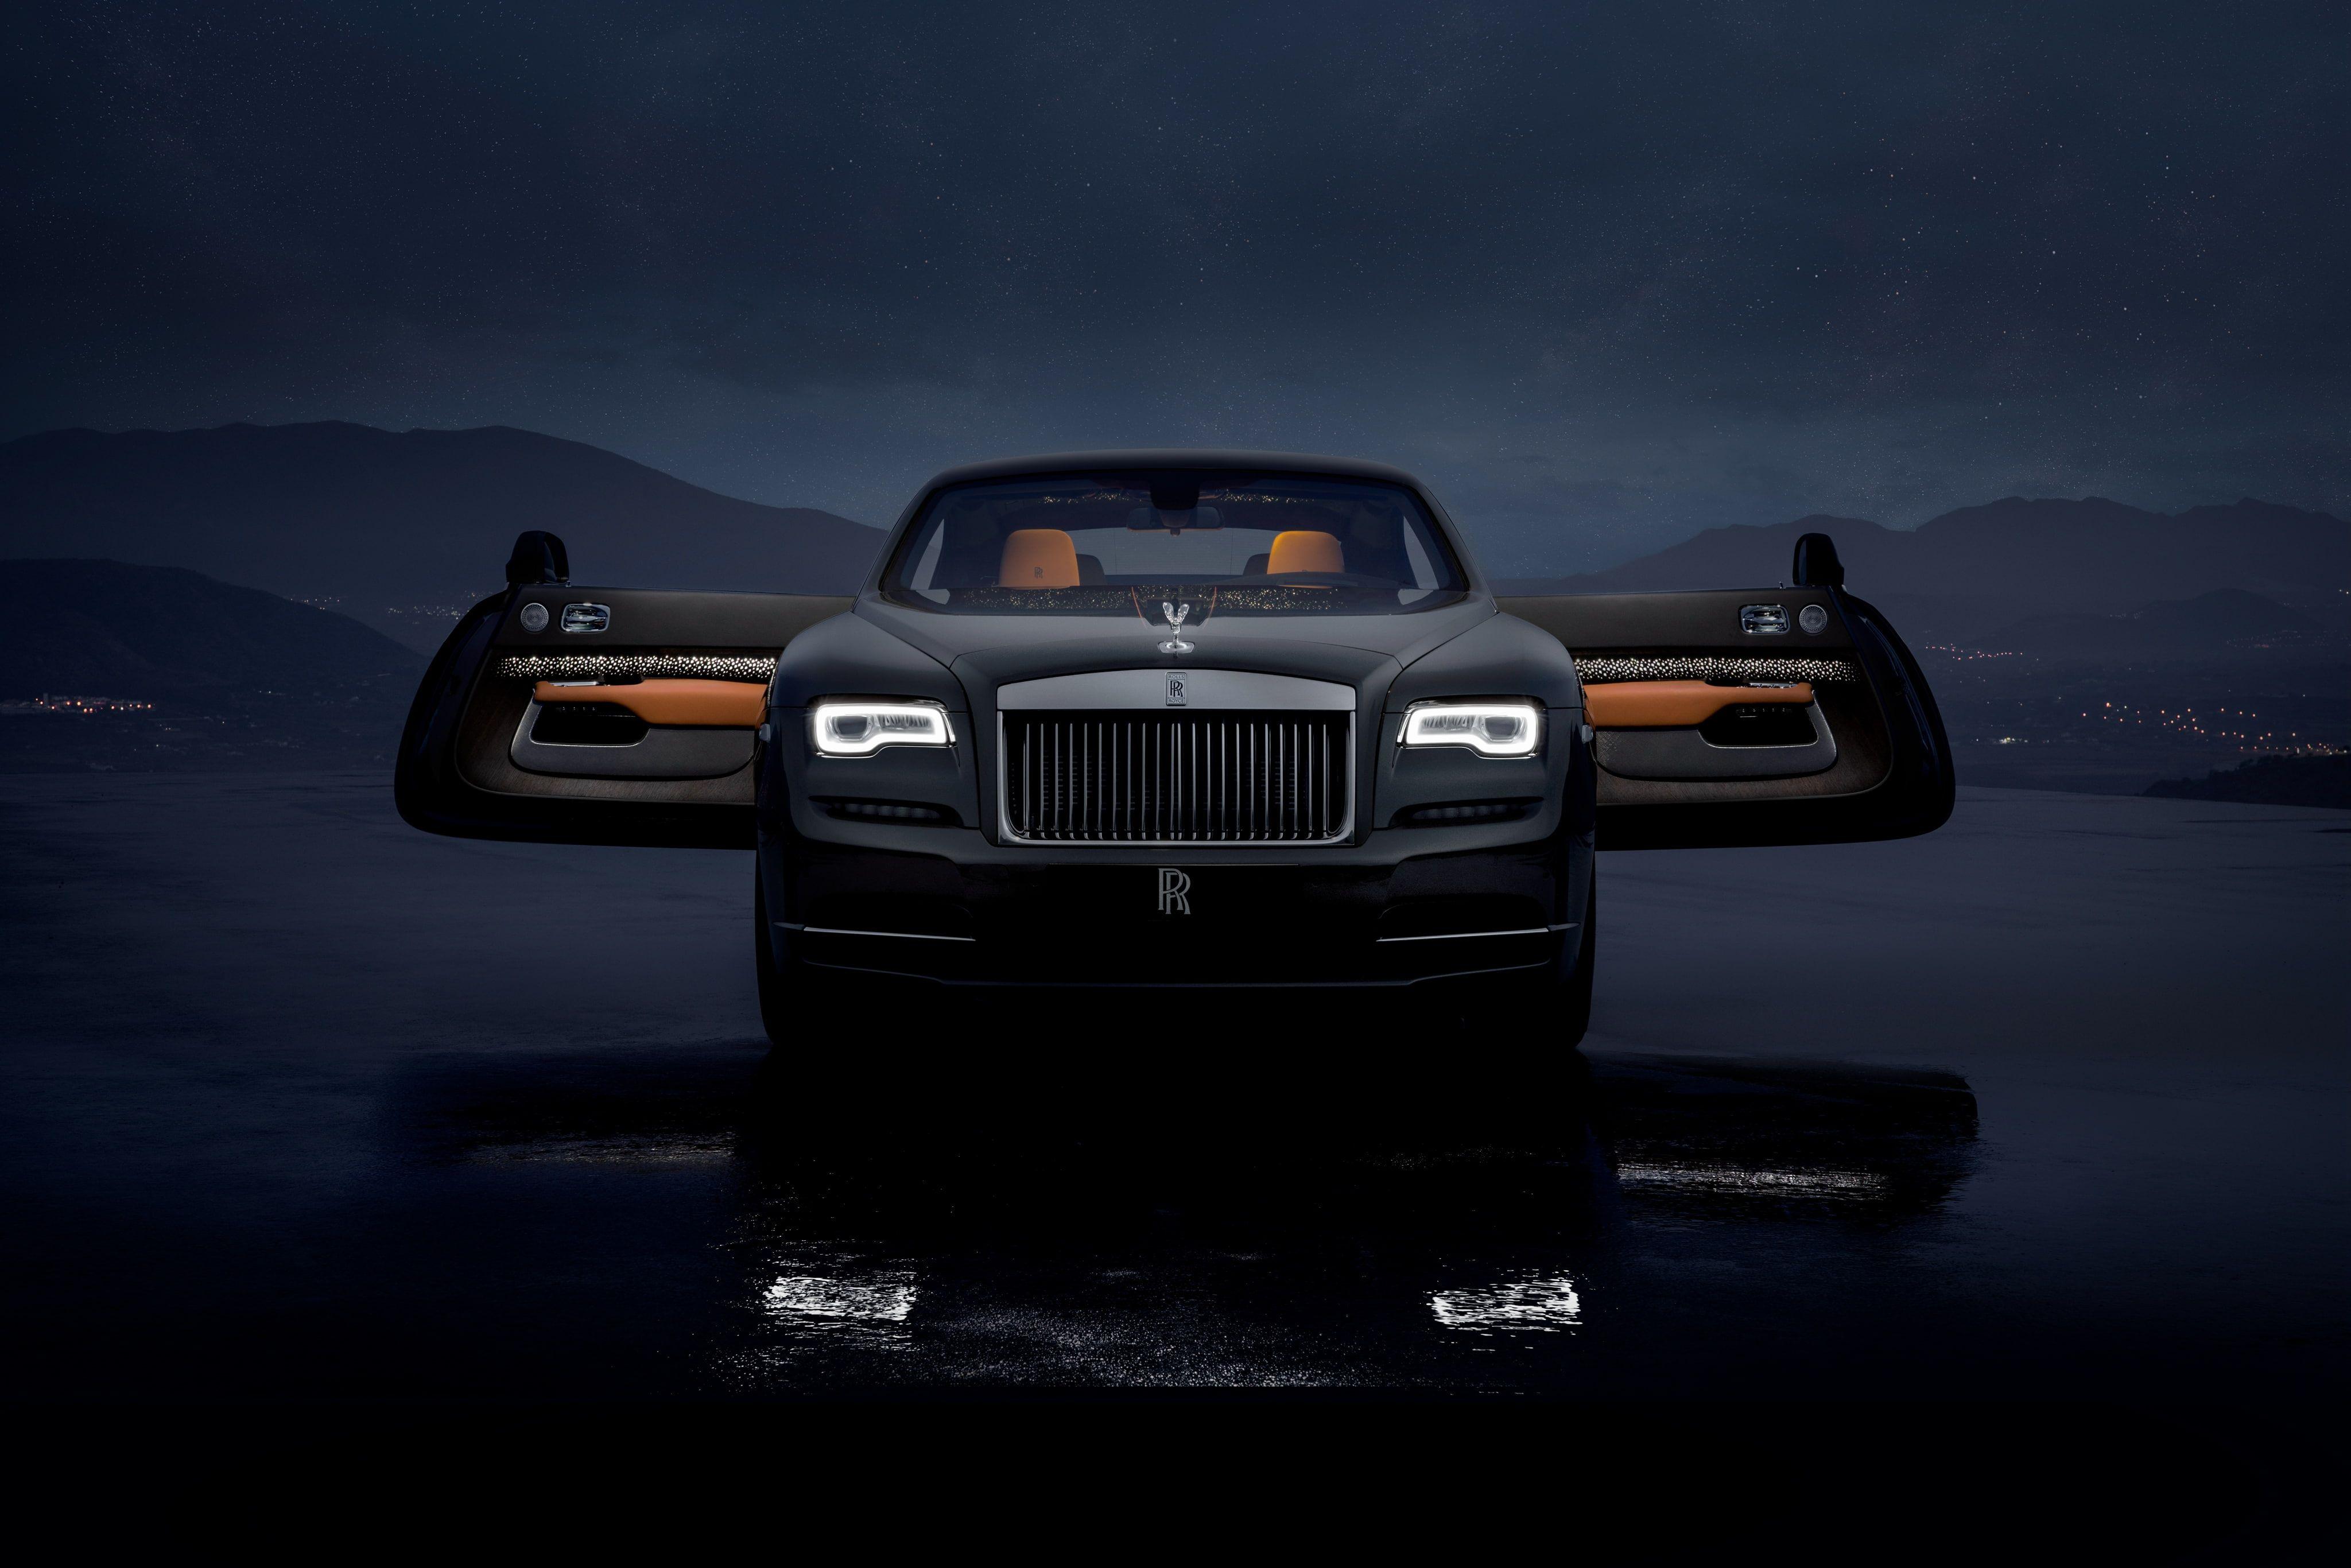 4k Rolls Royce Wraith Luminary Collection 2018 4k Wallpaper Hdwallpaper Desktop Rolls Royce Wraith Rolls Royce Wallpaper Rolls Royce